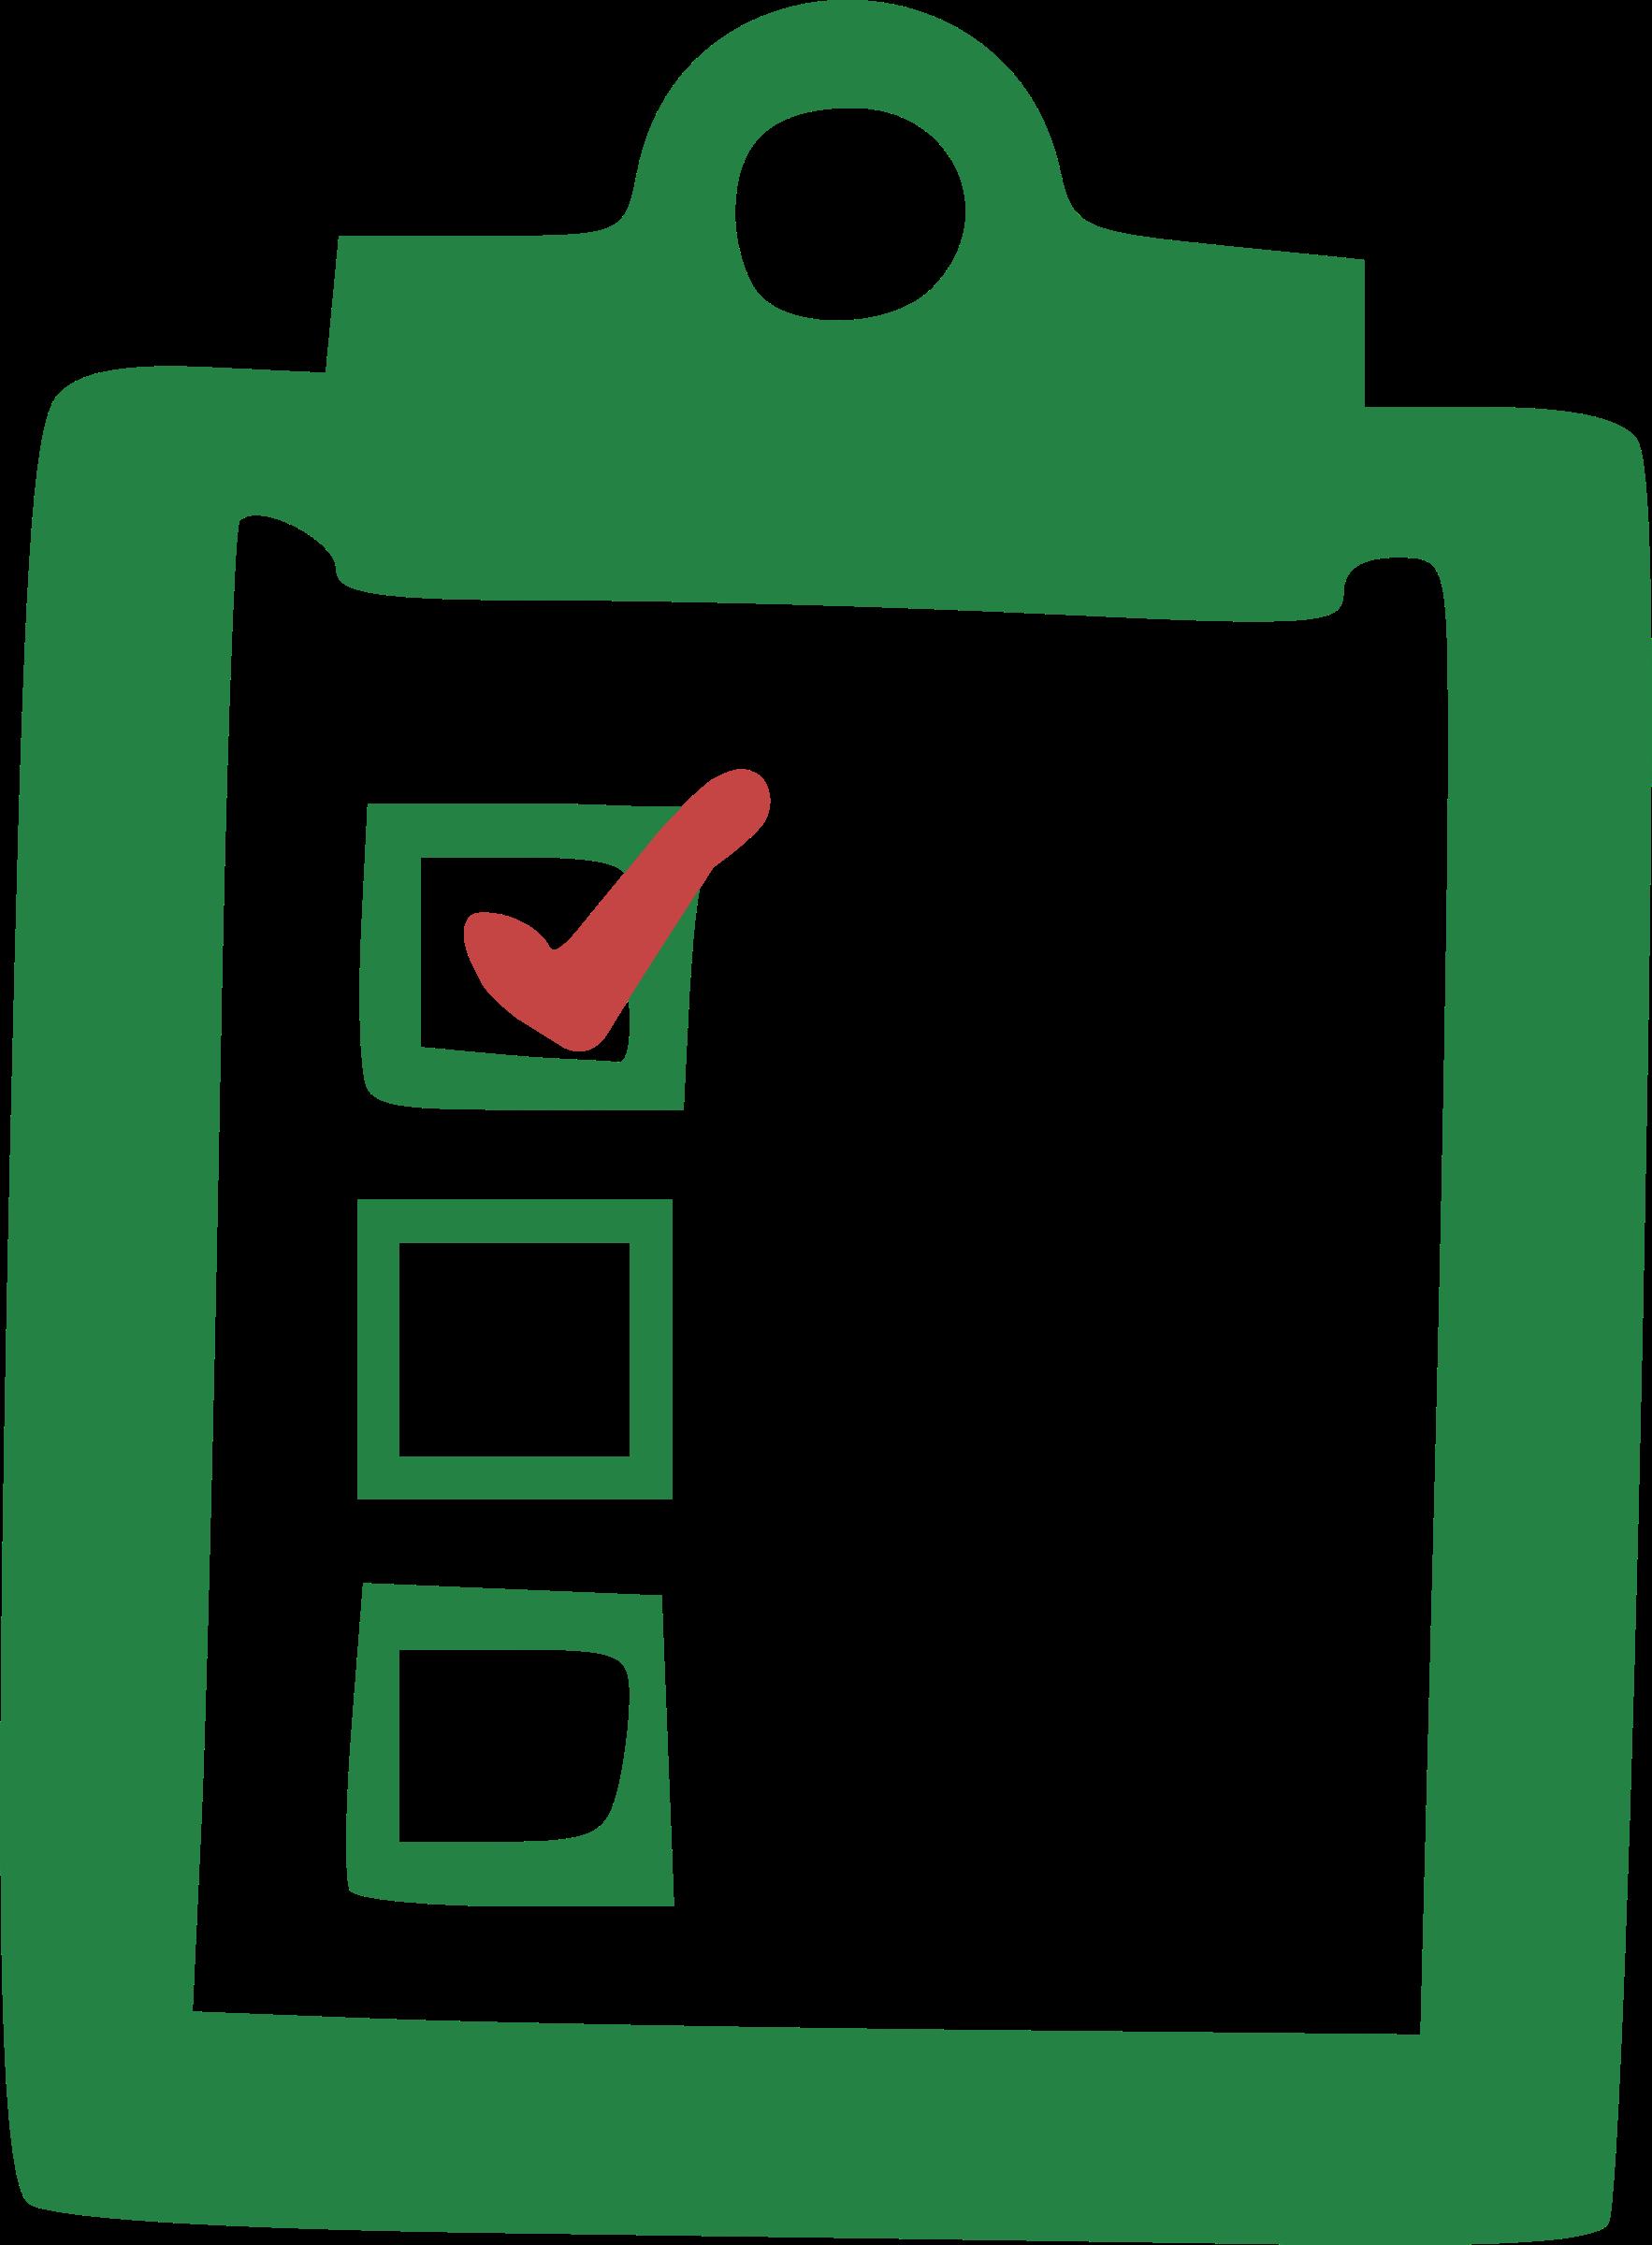 Clipboard clipart check mark. Checklist big image png